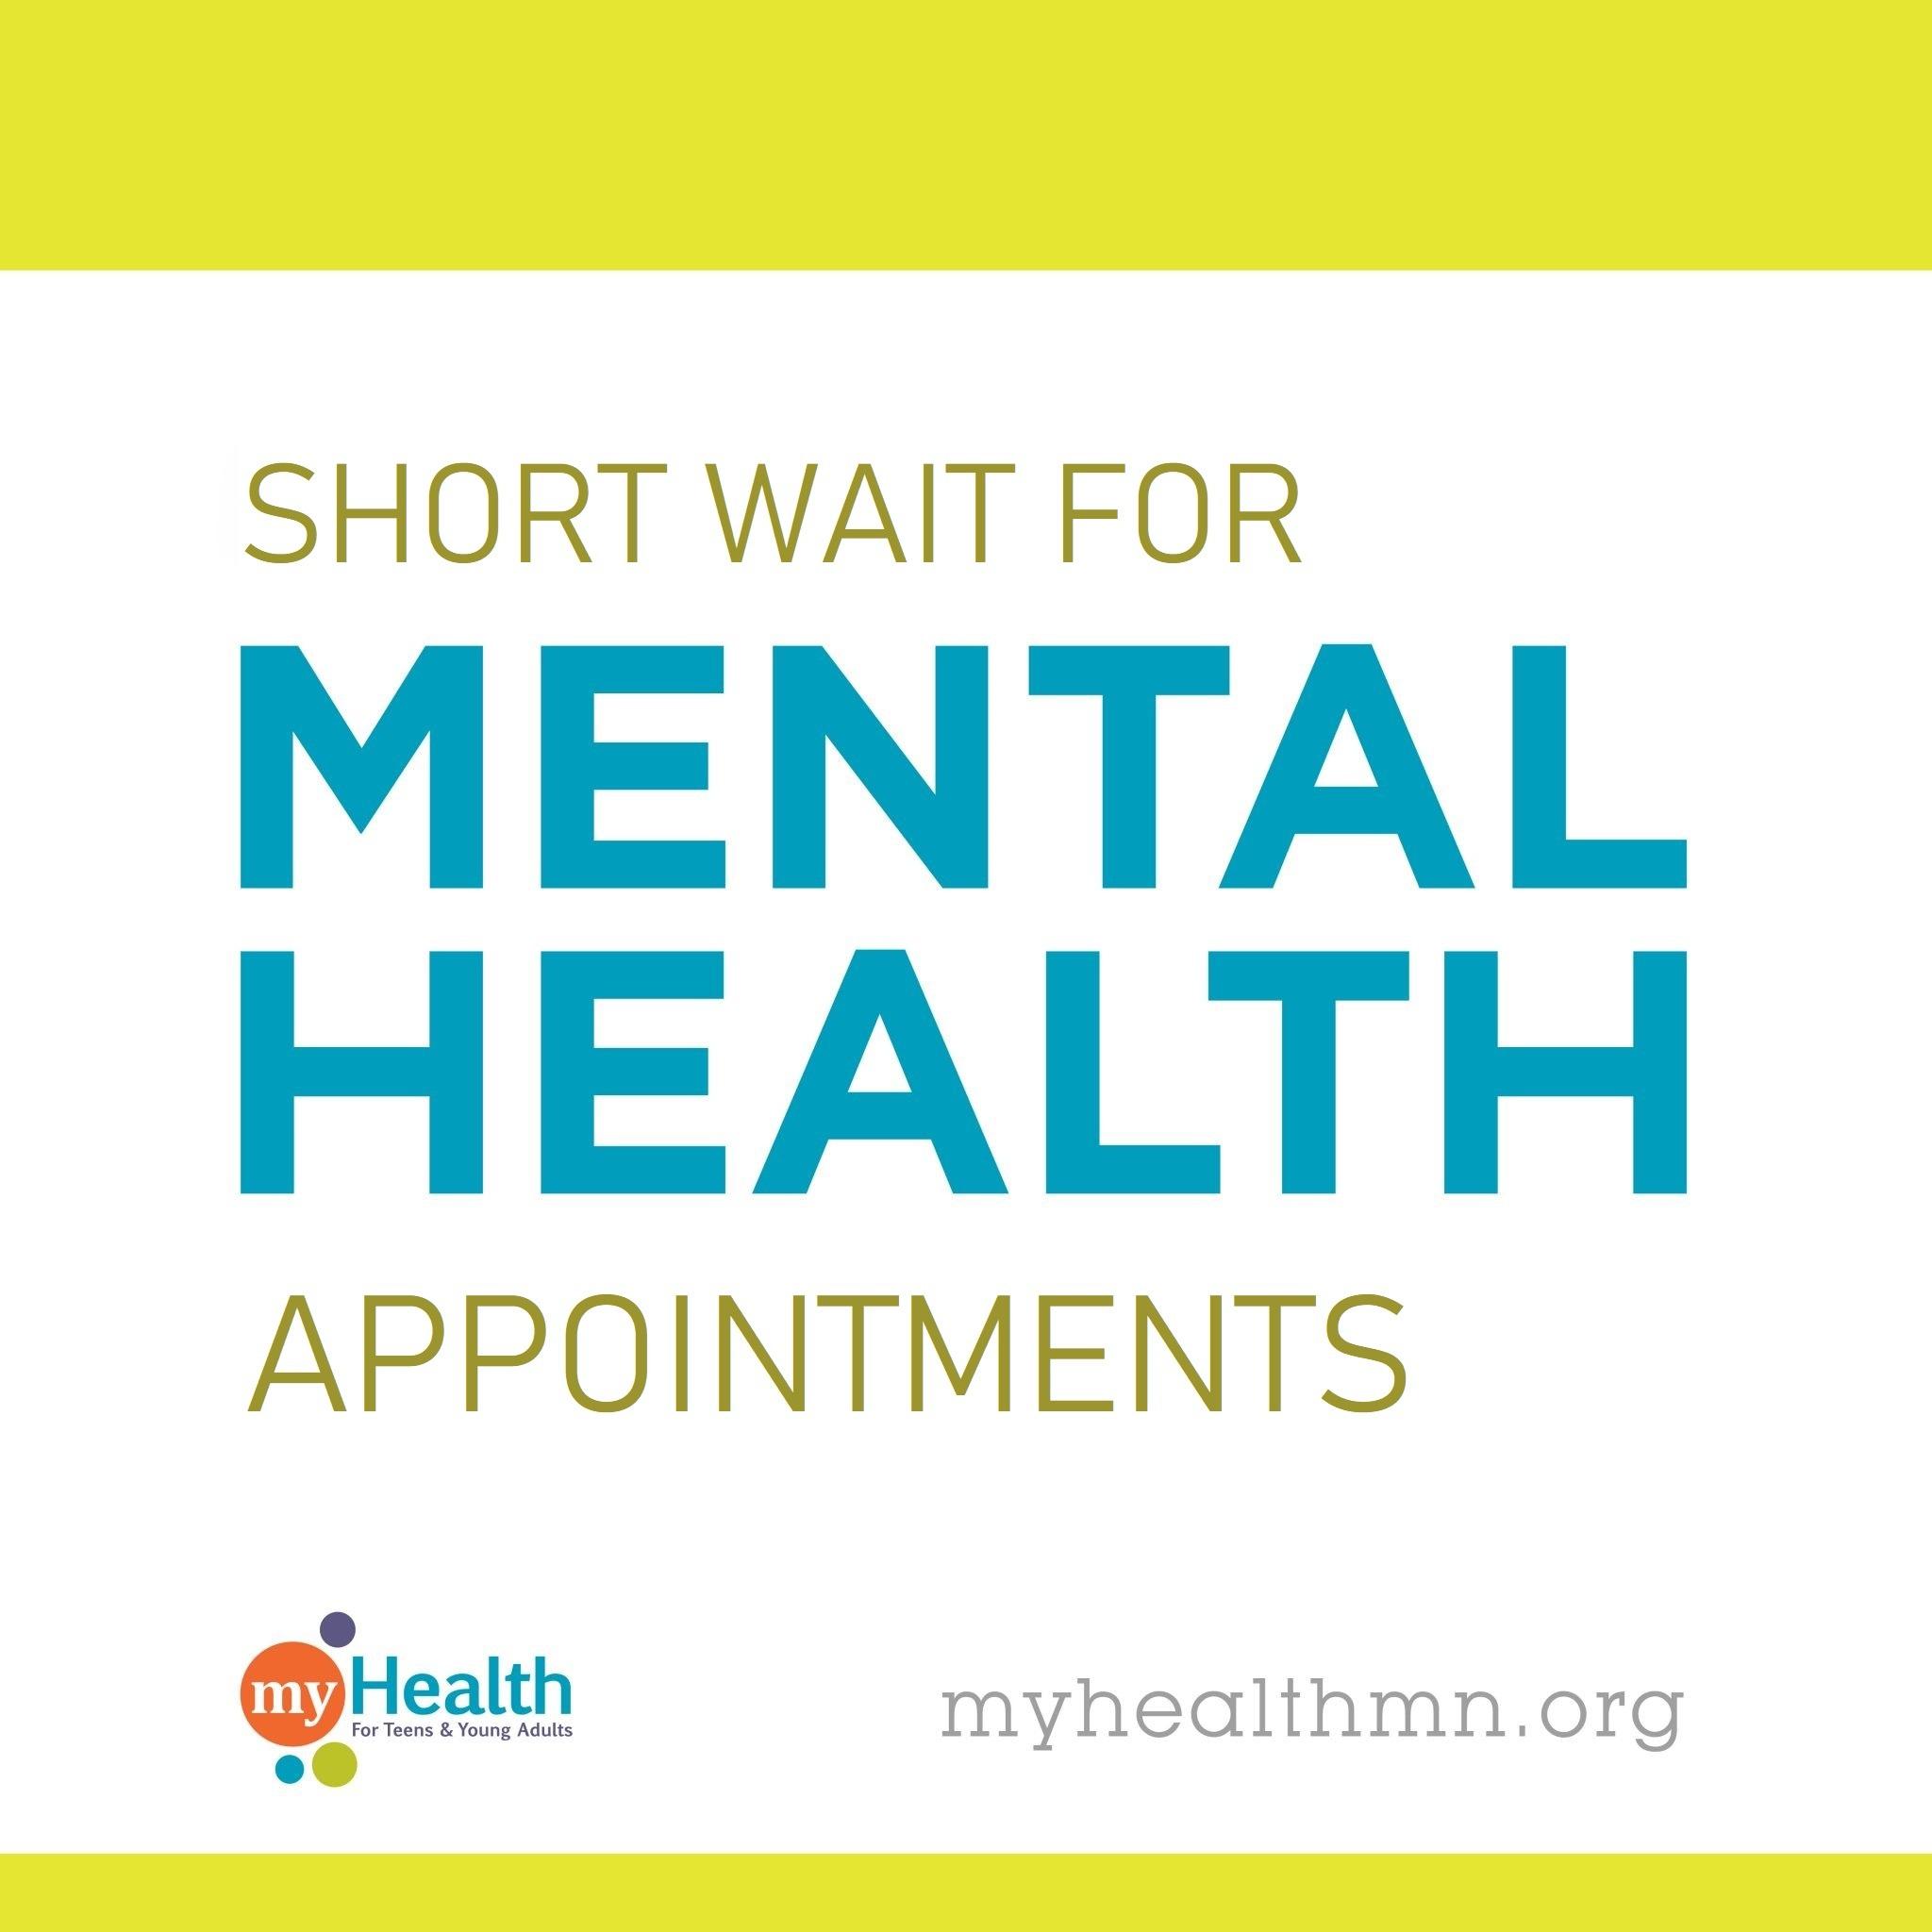 Mental Health Waitlist Photo